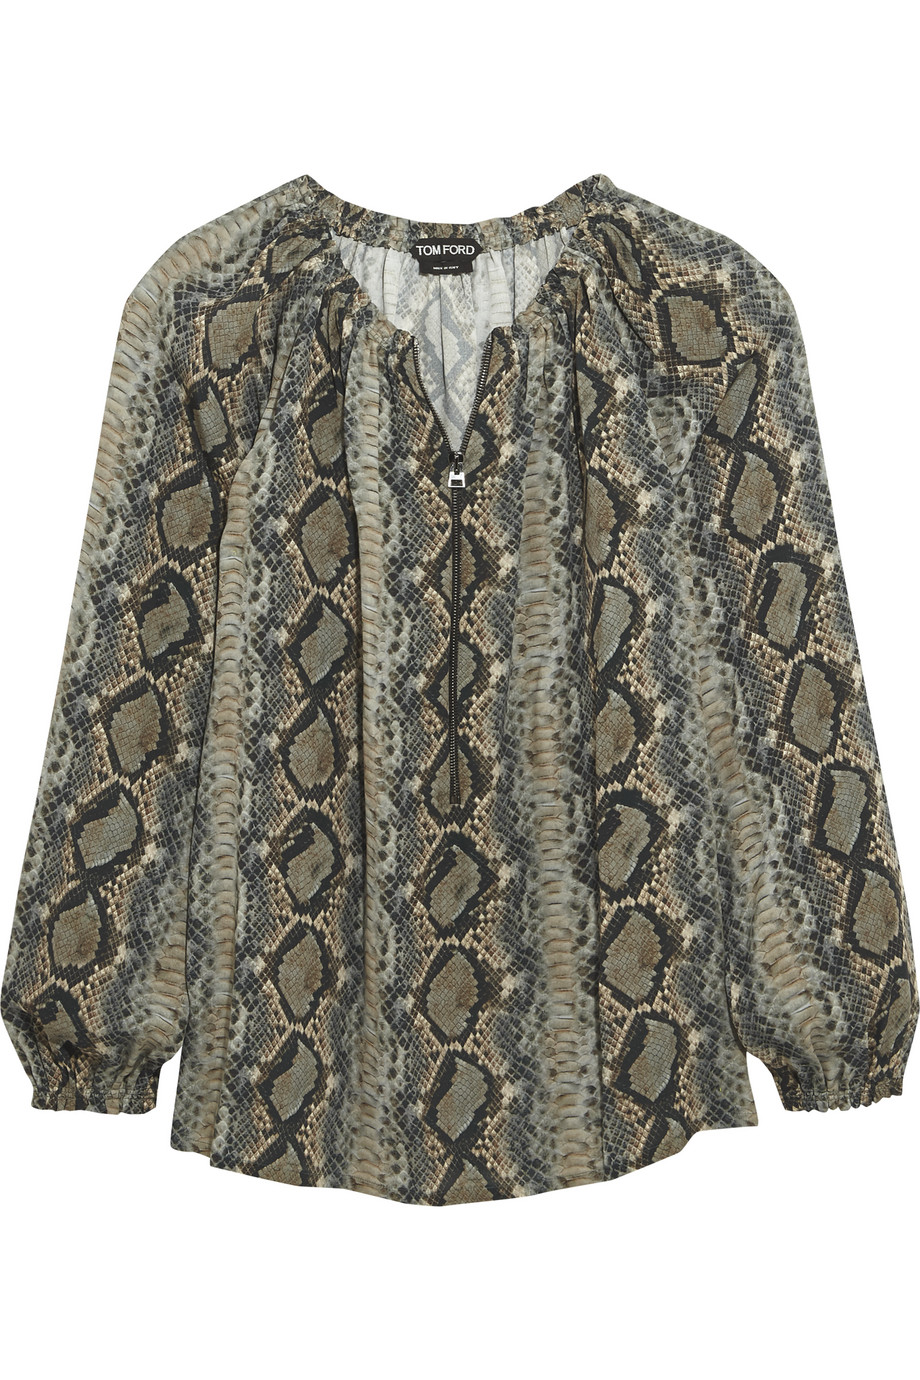 Snake-Print Silk-Georgette Blouse, Size: 38